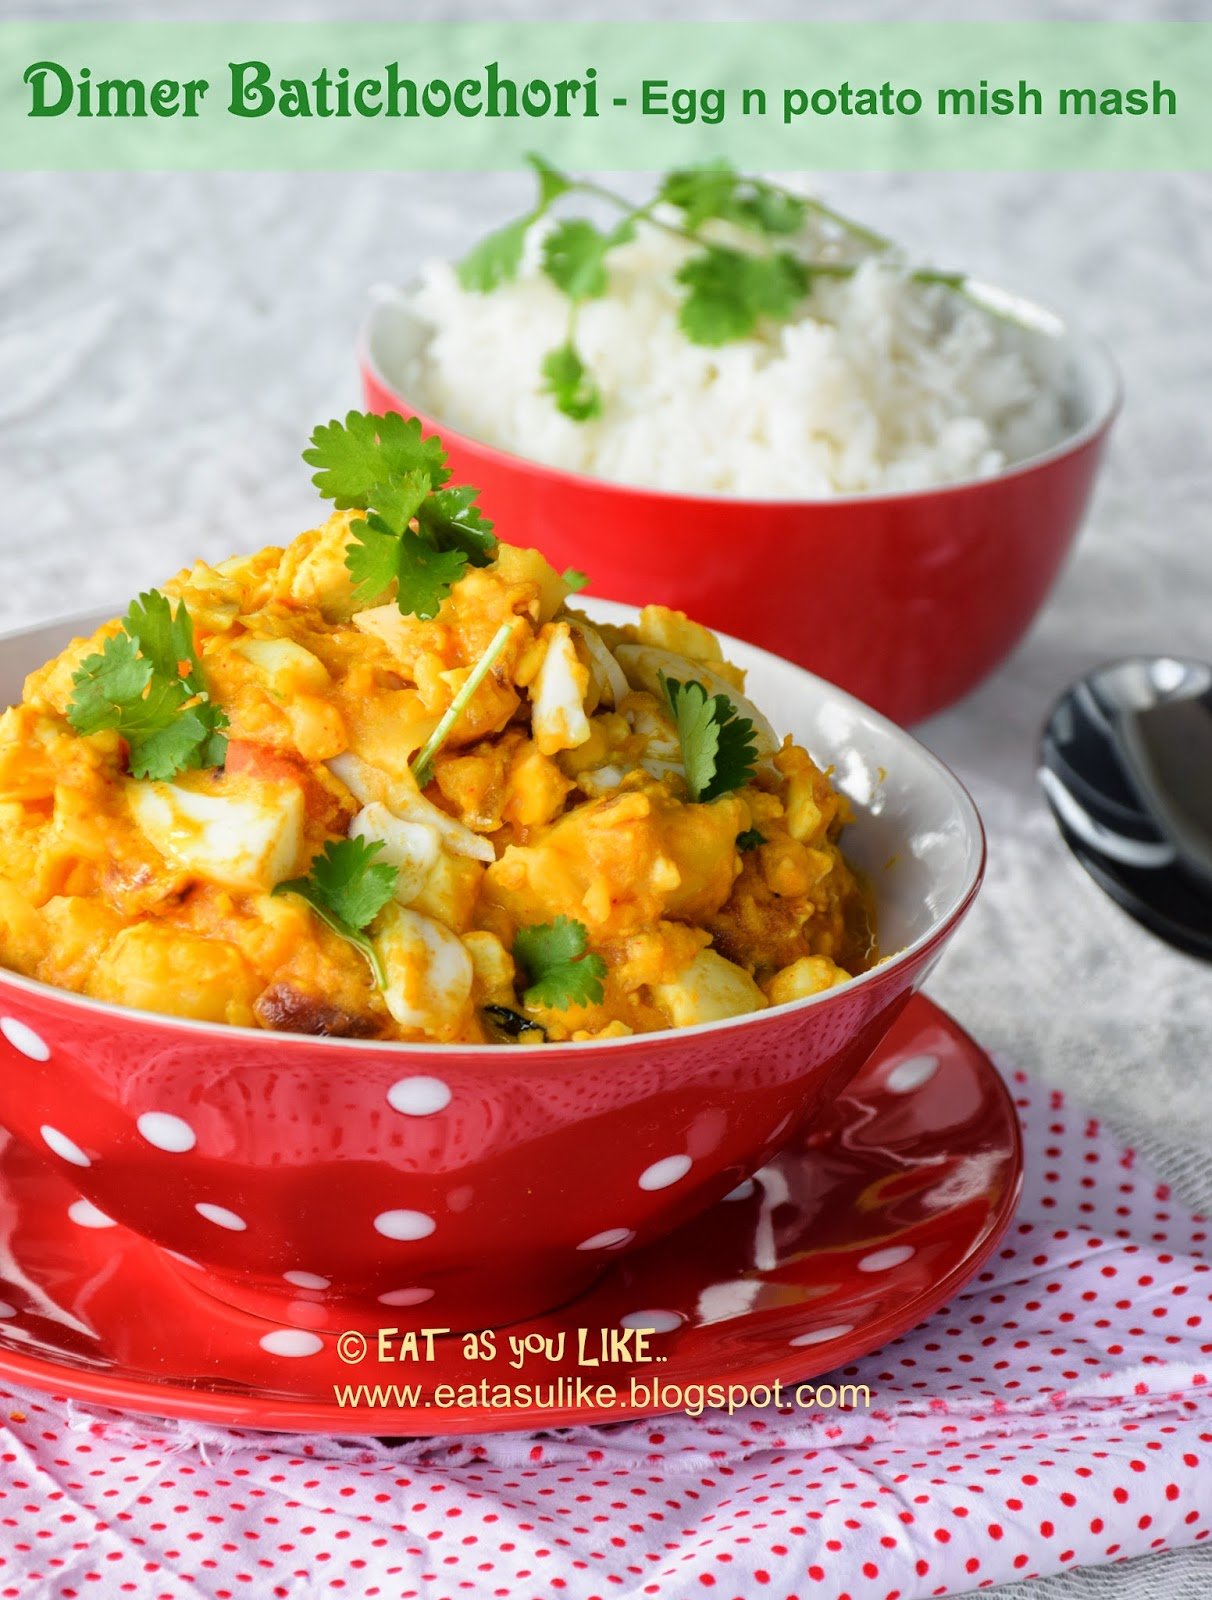 http://eatasulike.blogspot.com.au/2014/05/dimer-batichchori-egg-n-potato-mish-mash.html